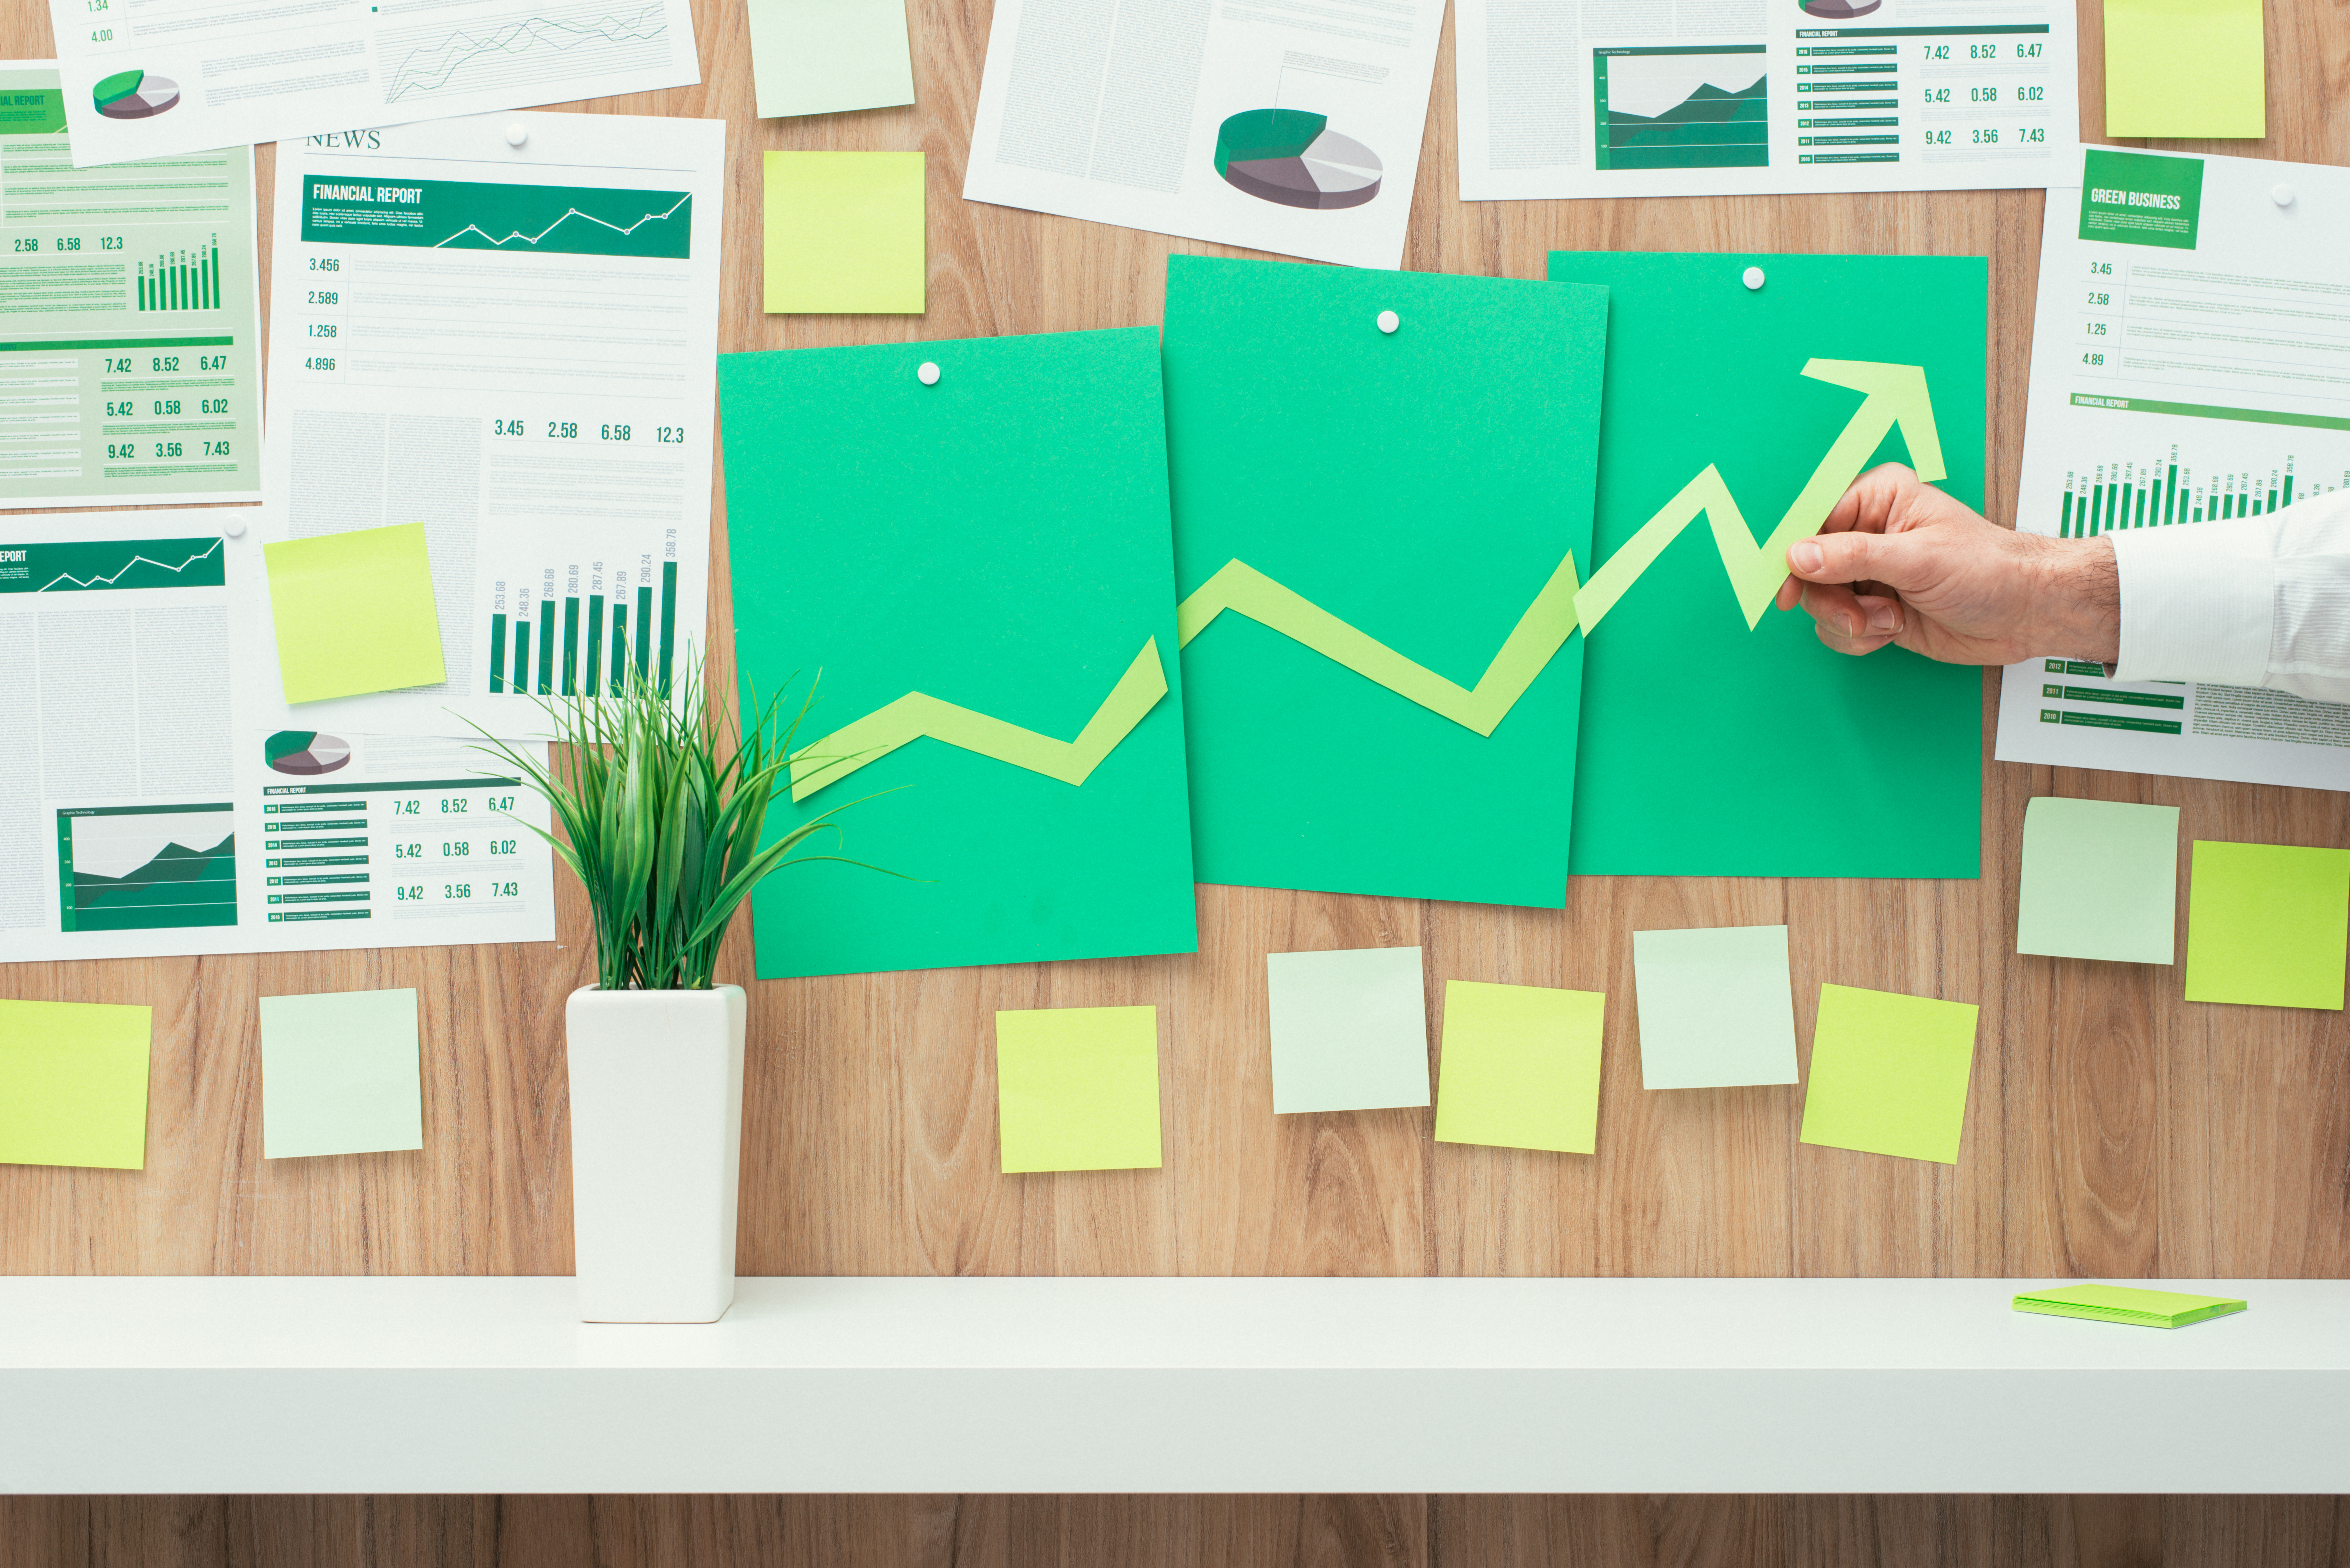 PLM, Line planning, Profitability, ERP